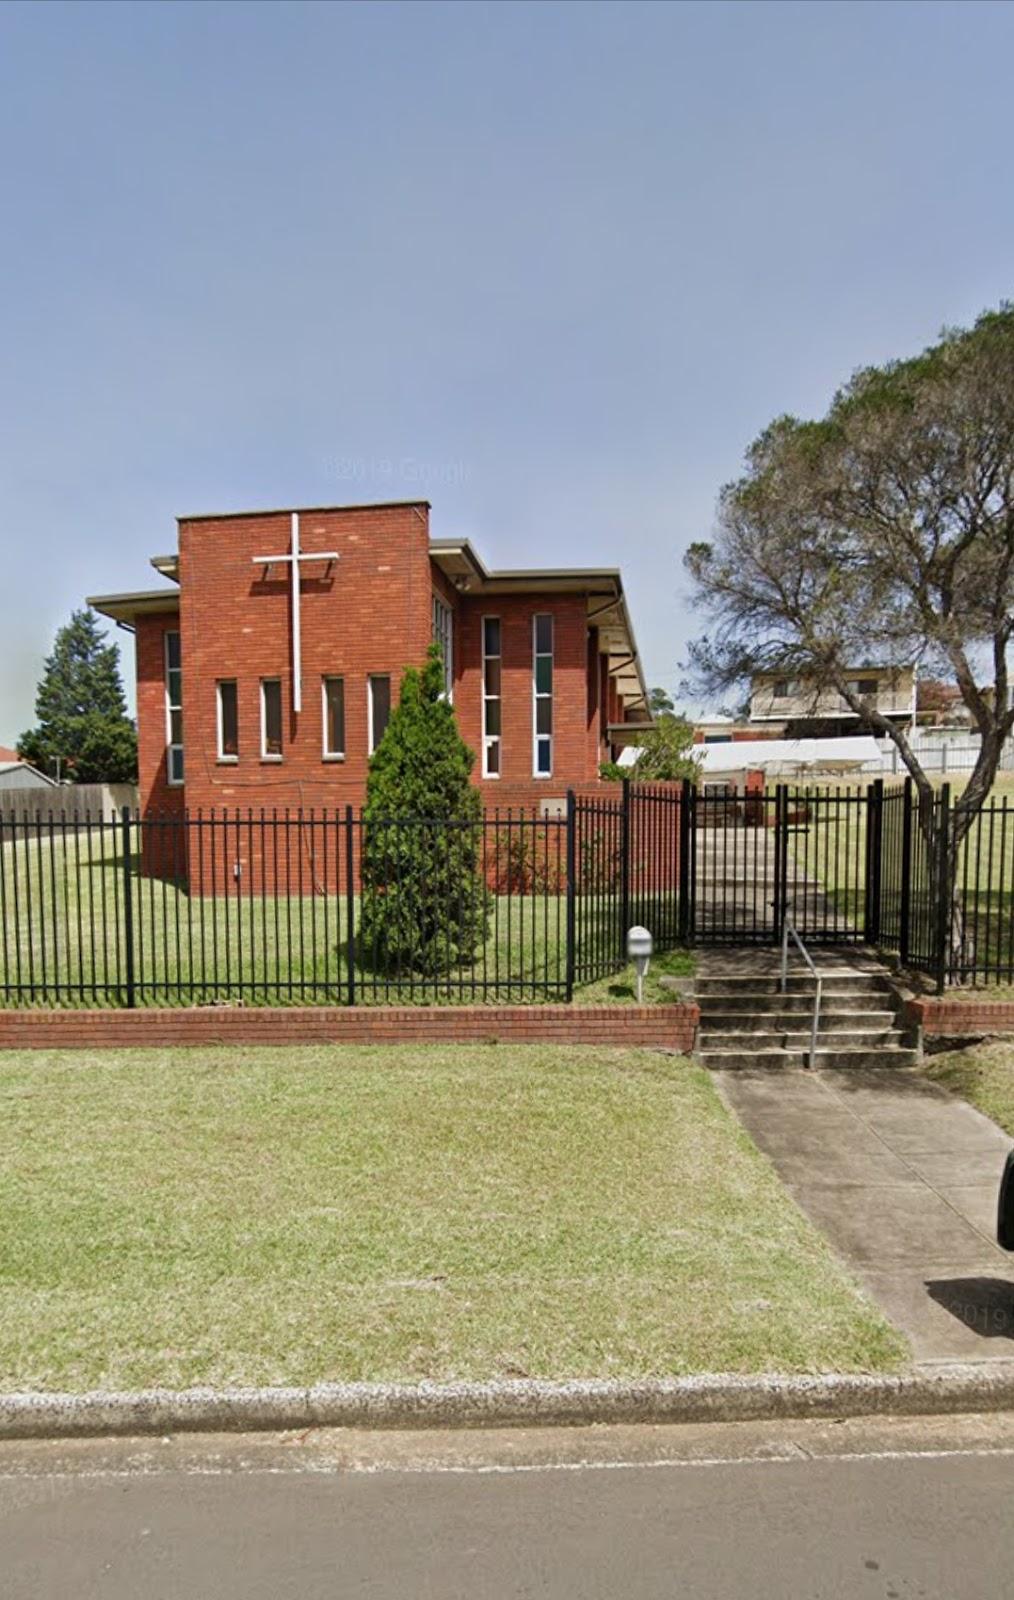 Our lady of lebanon maronite church | church | 80 Denise St, Lake Heights NSW 2502, Australia